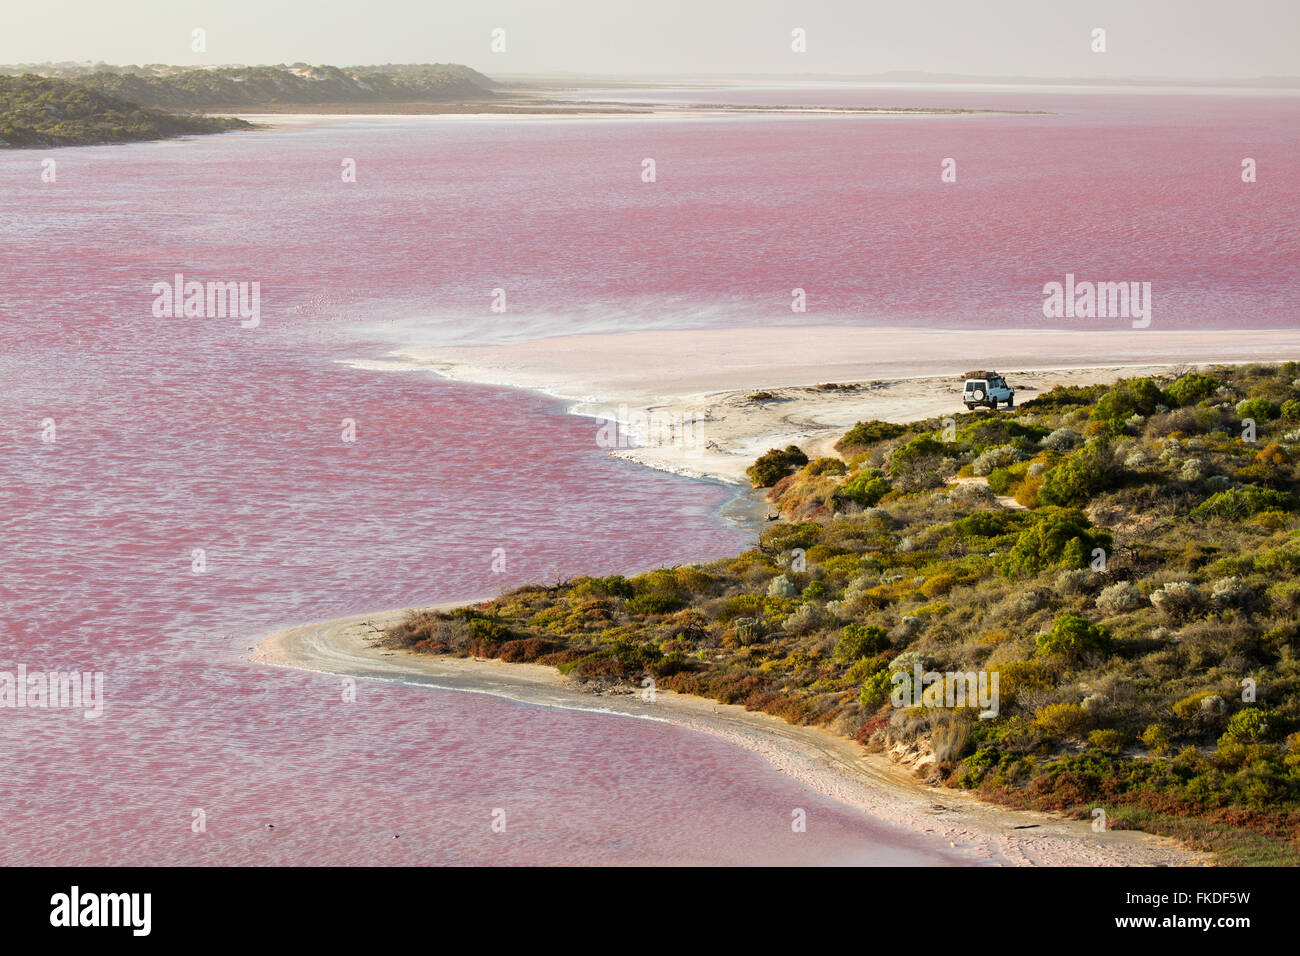 troopy an den Ufern der Lagune rosa Hutt im Port Gregory, West-Australien Stockbild